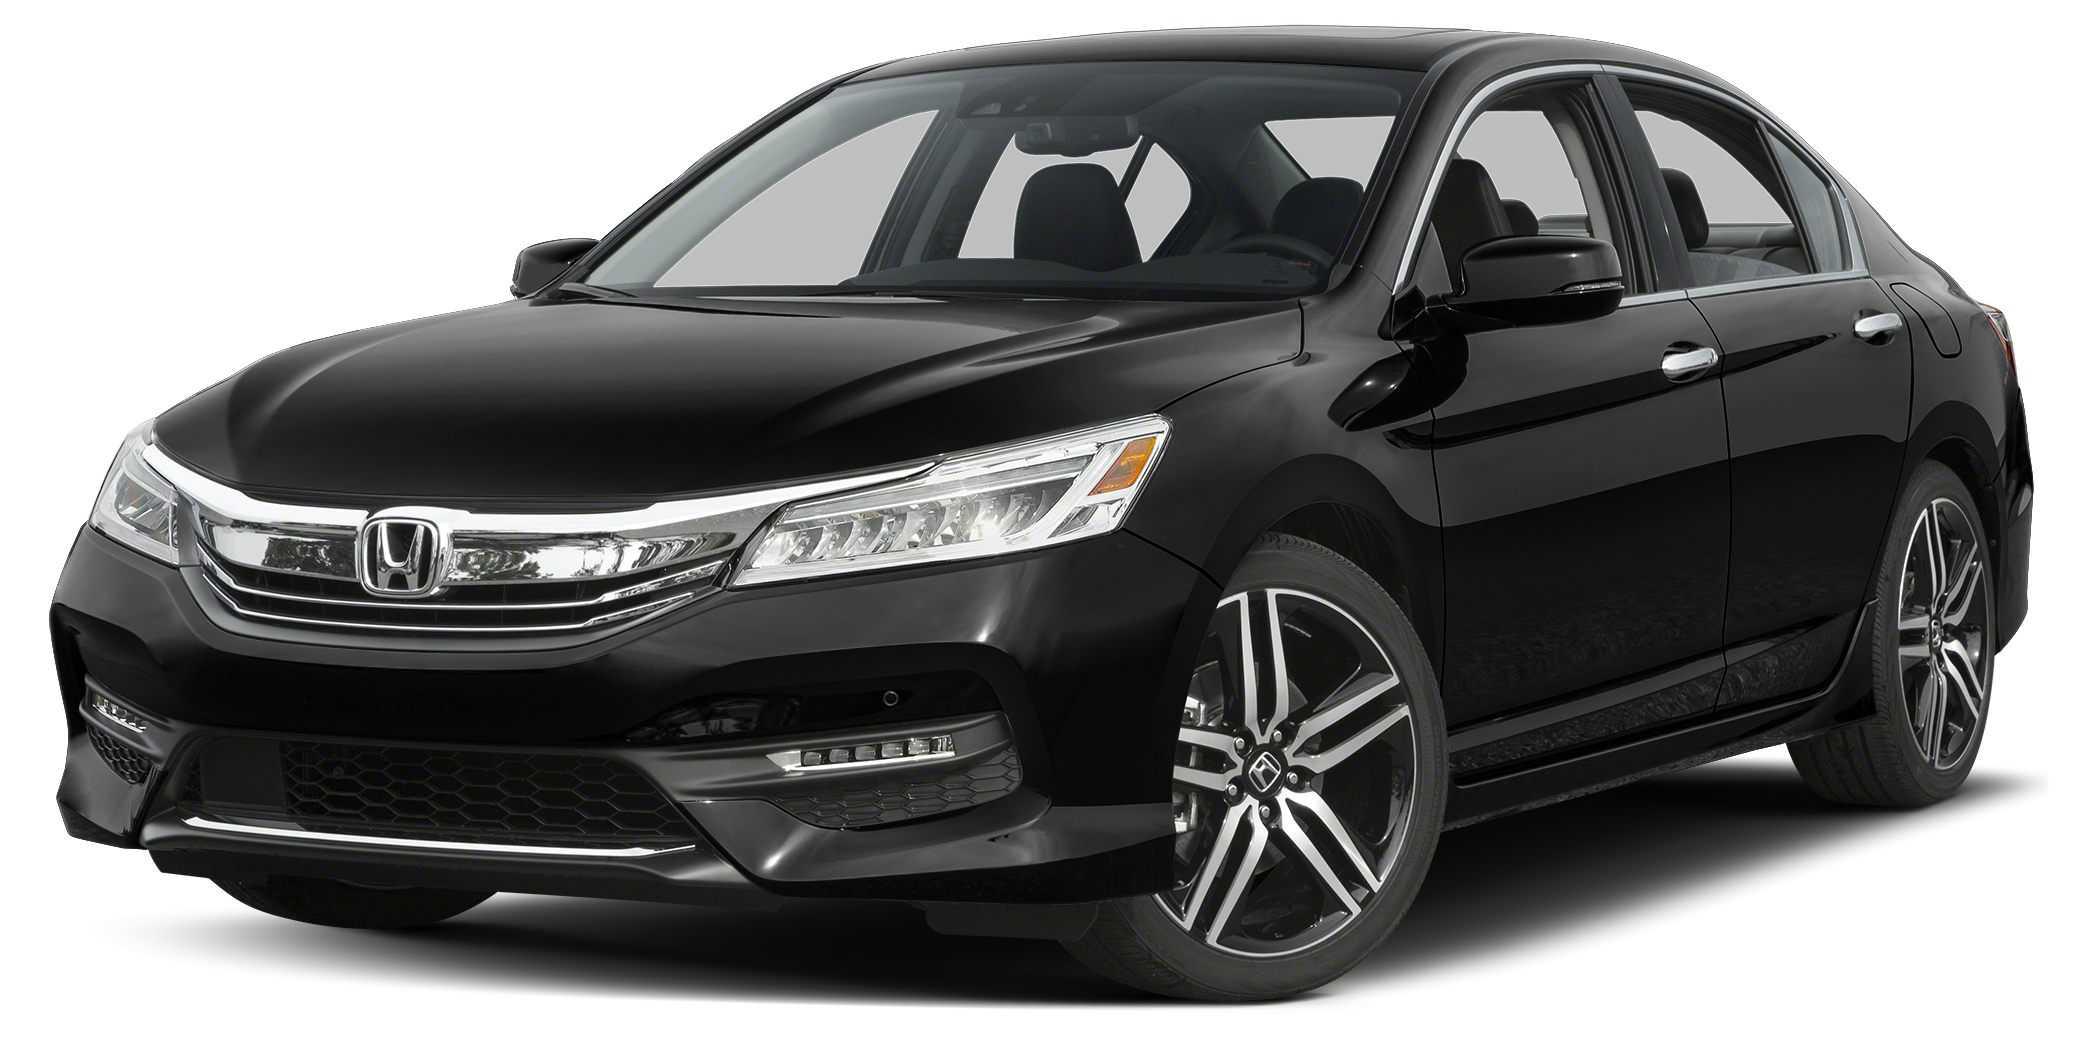 2017 honda accord for sale in waldorf md 1hgcr3f93ha033169 for Honda dealership waldorf md